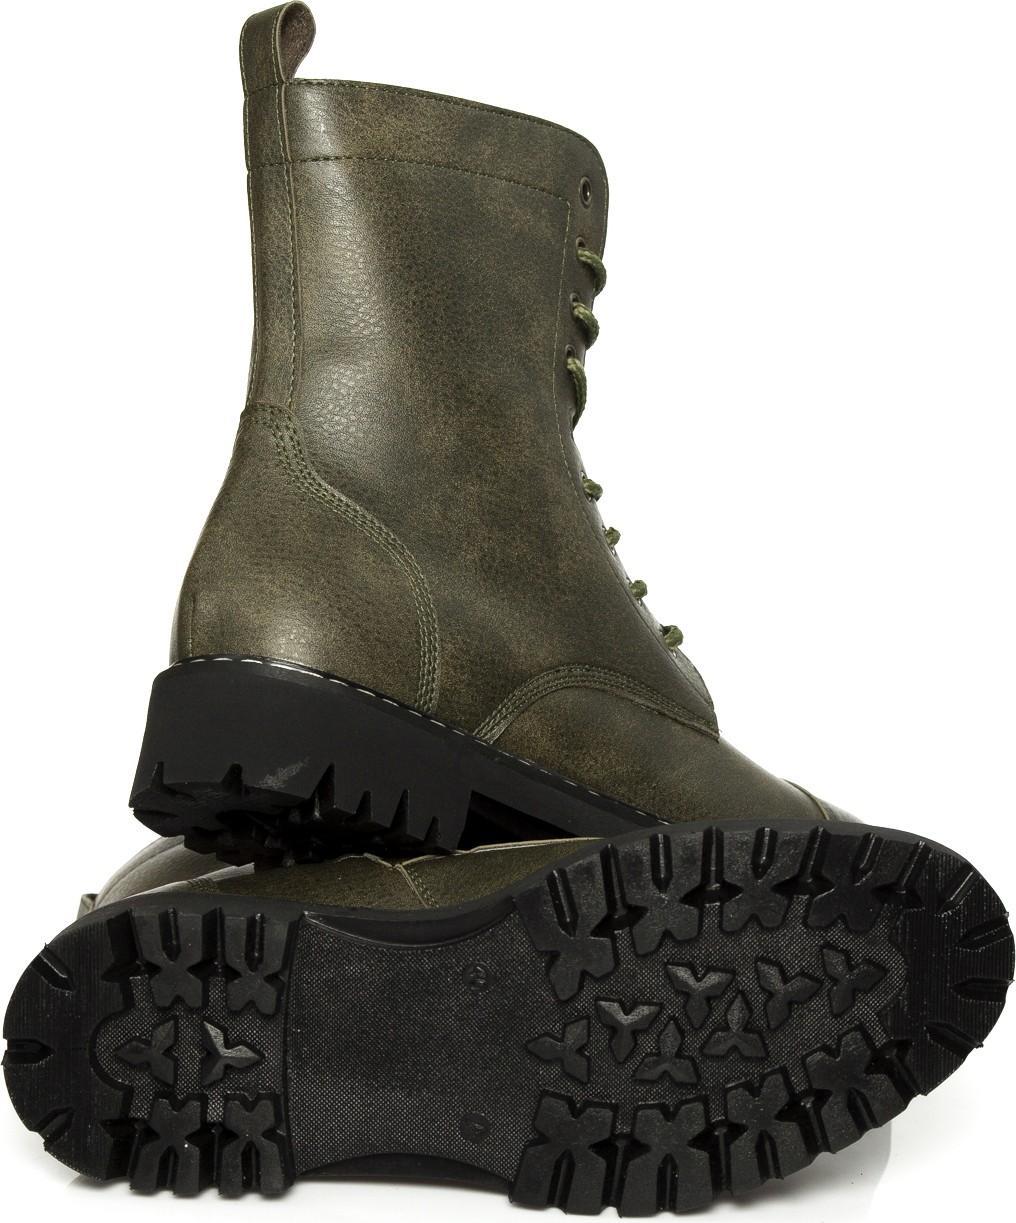 2019 Chekich Mid Calf Men'S Boot 09 HB 003594775 From Hepsi_fashion, $52.14 | DHgate.Com